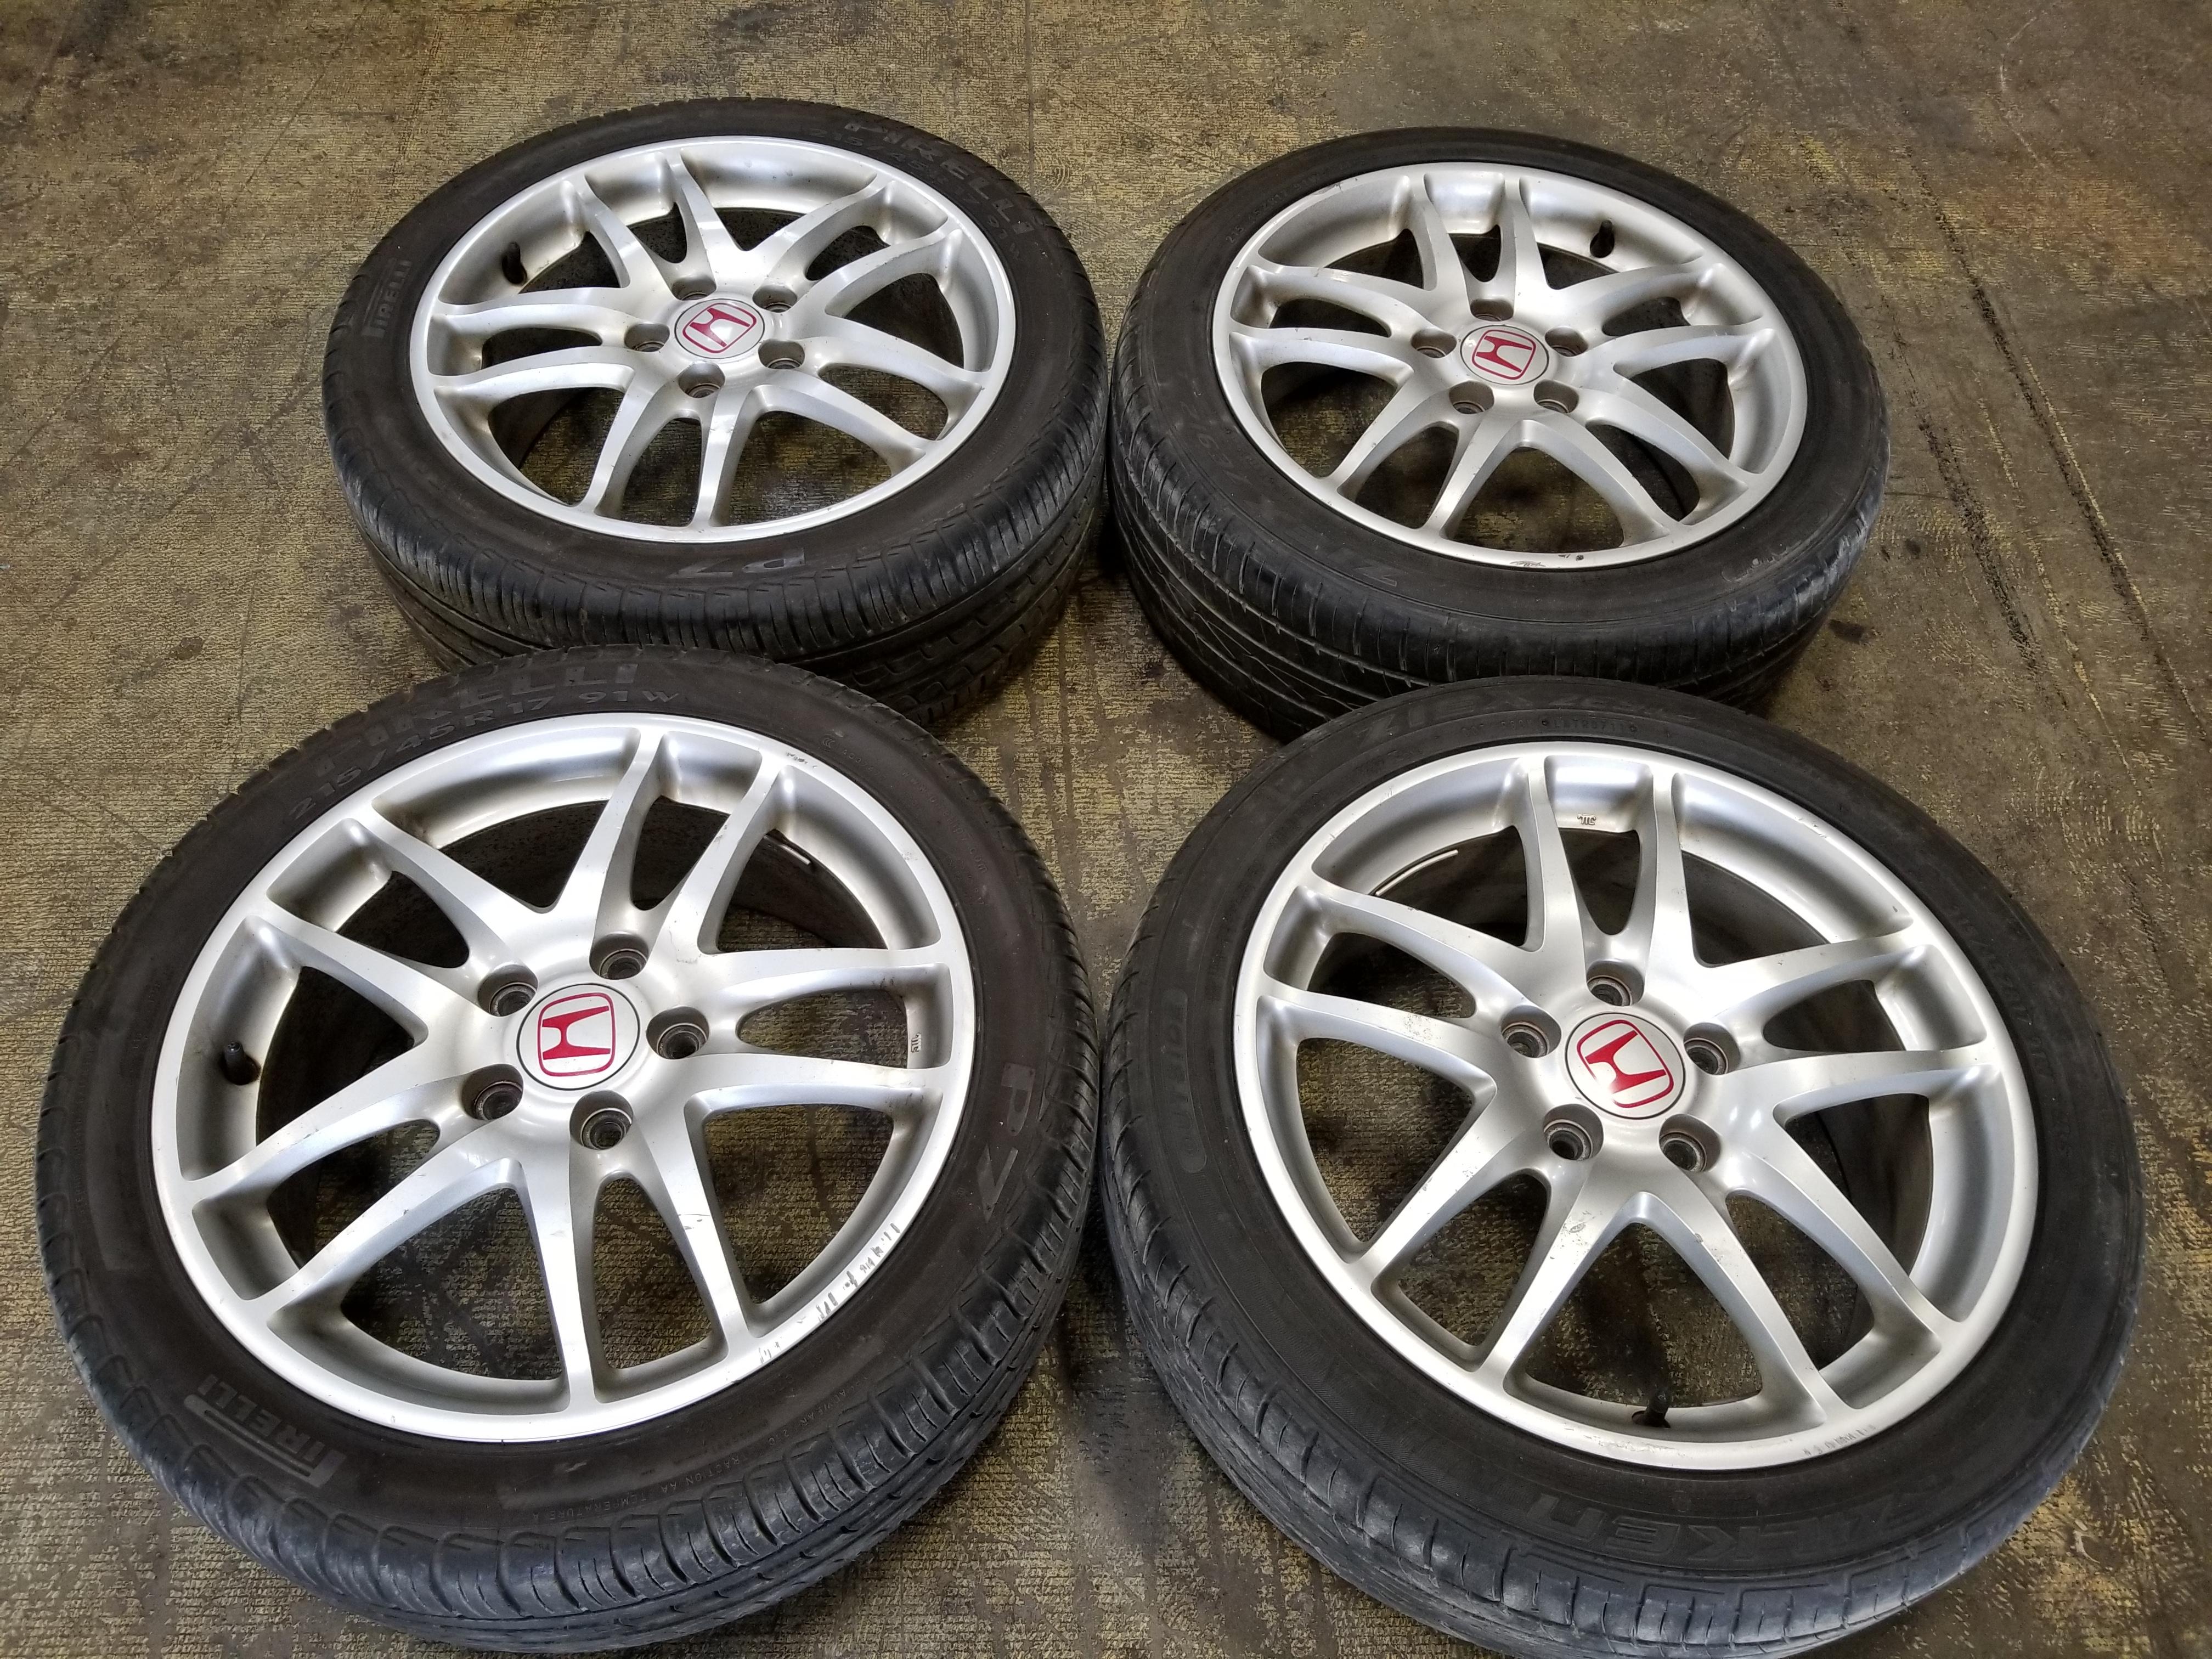 DC Integra Type R RSX Type S Wheels Bridgestone Tires - Acura rsx type s rims for sale